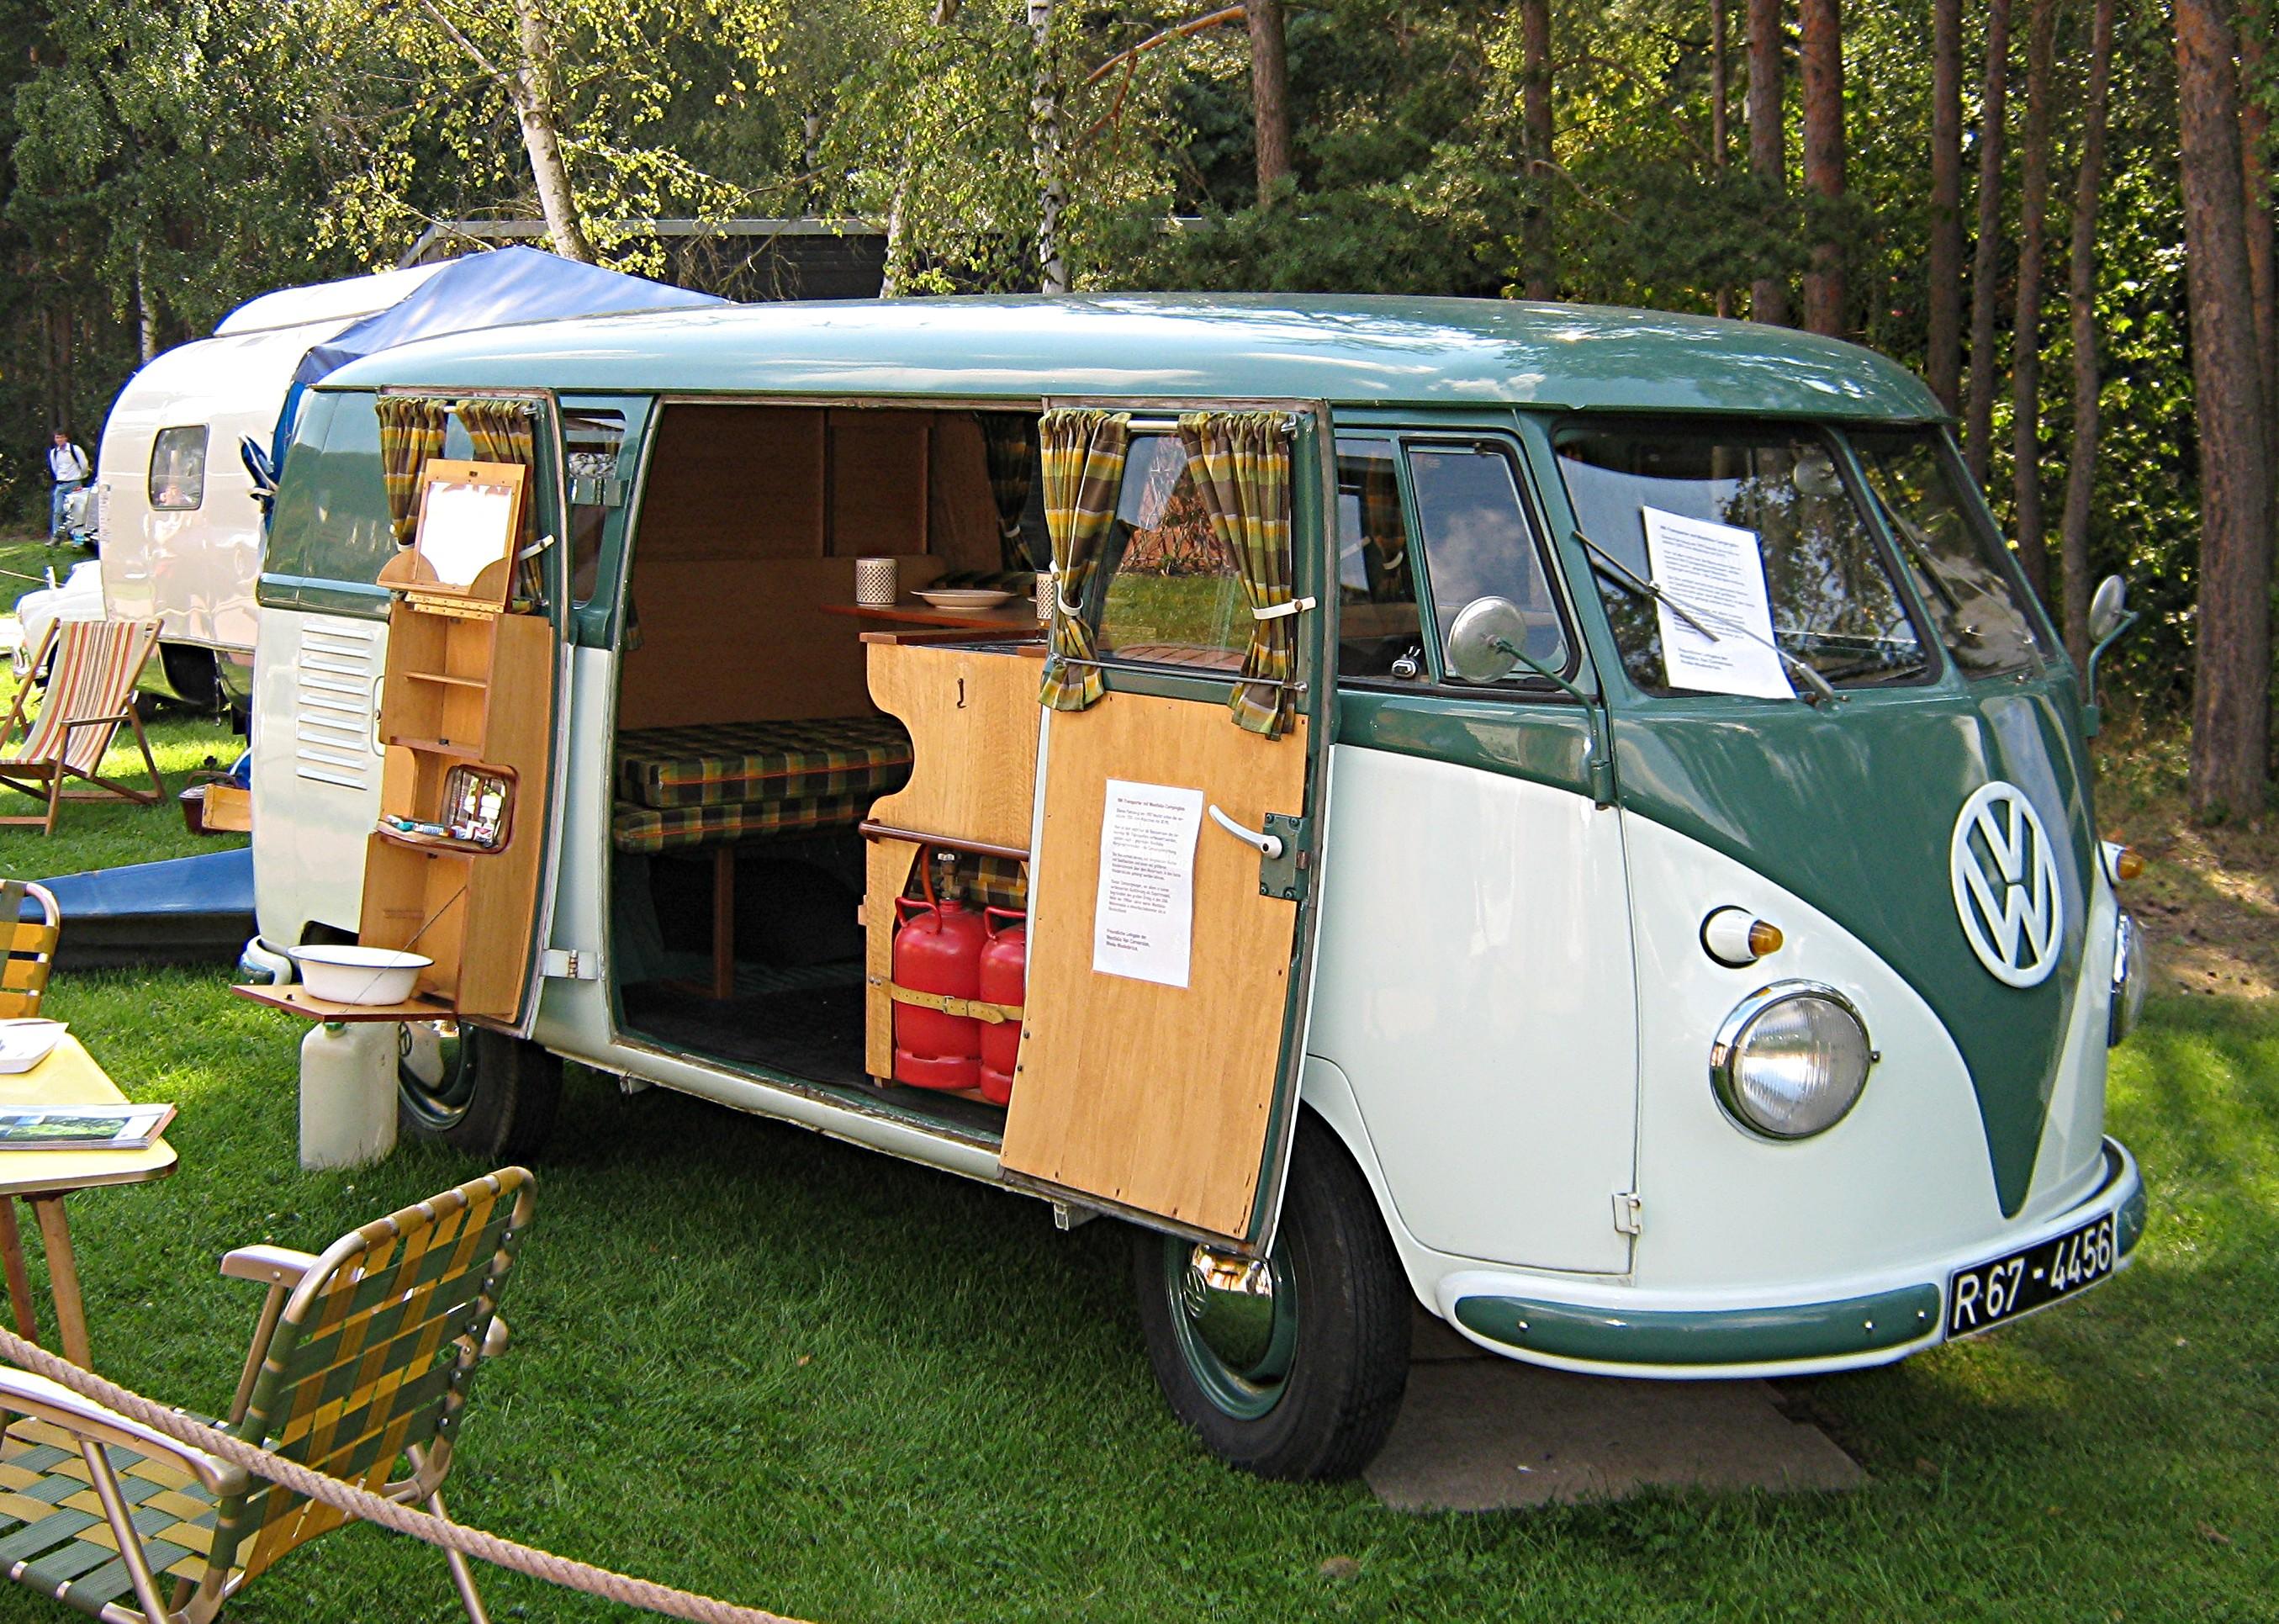 file westfalia campingbox wikipedia. Black Bedroom Furniture Sets. Home Design Ideas